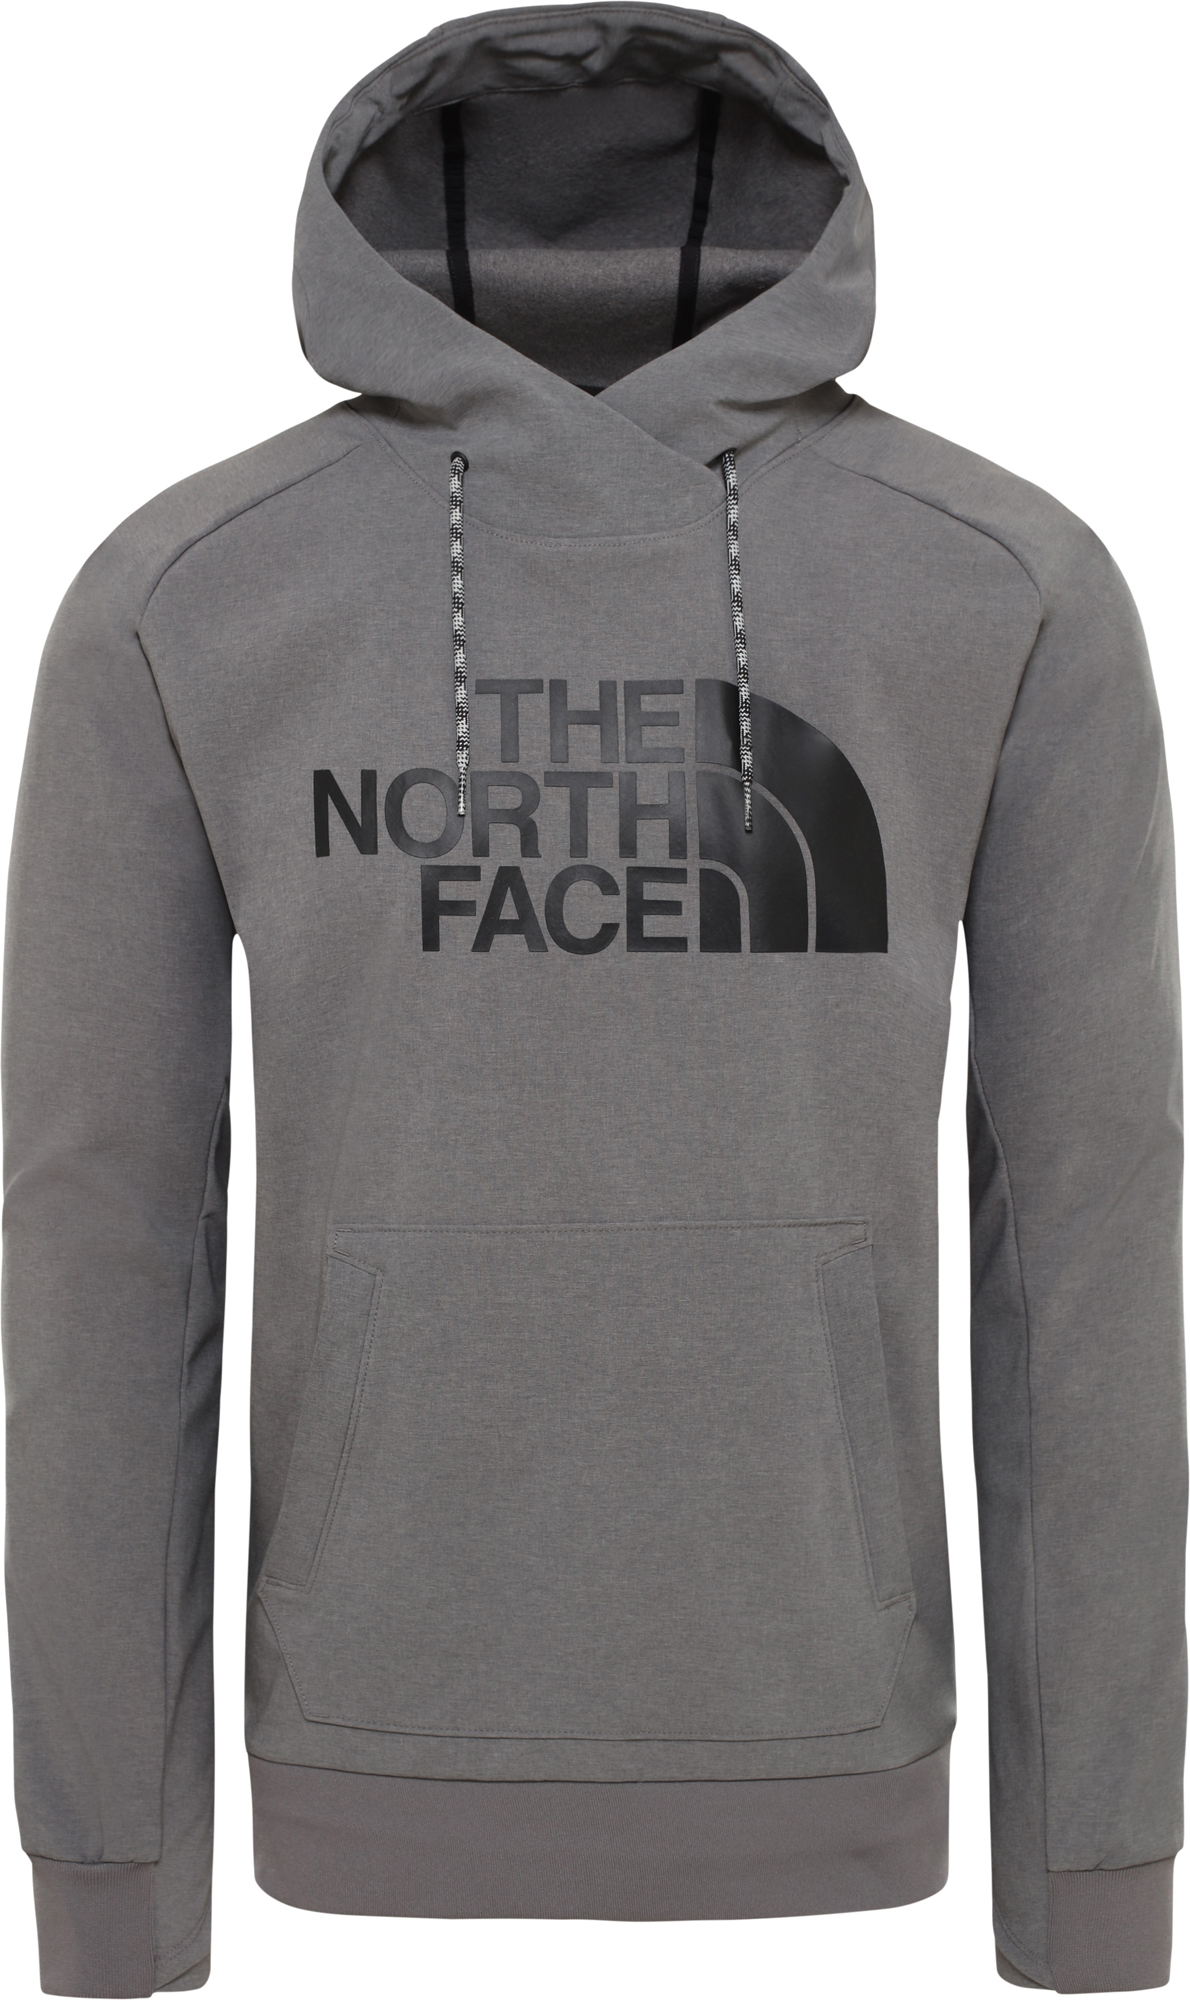 The North Face Худи мужская The North Face Tekno Logo, размер 46 худи print bar the clash